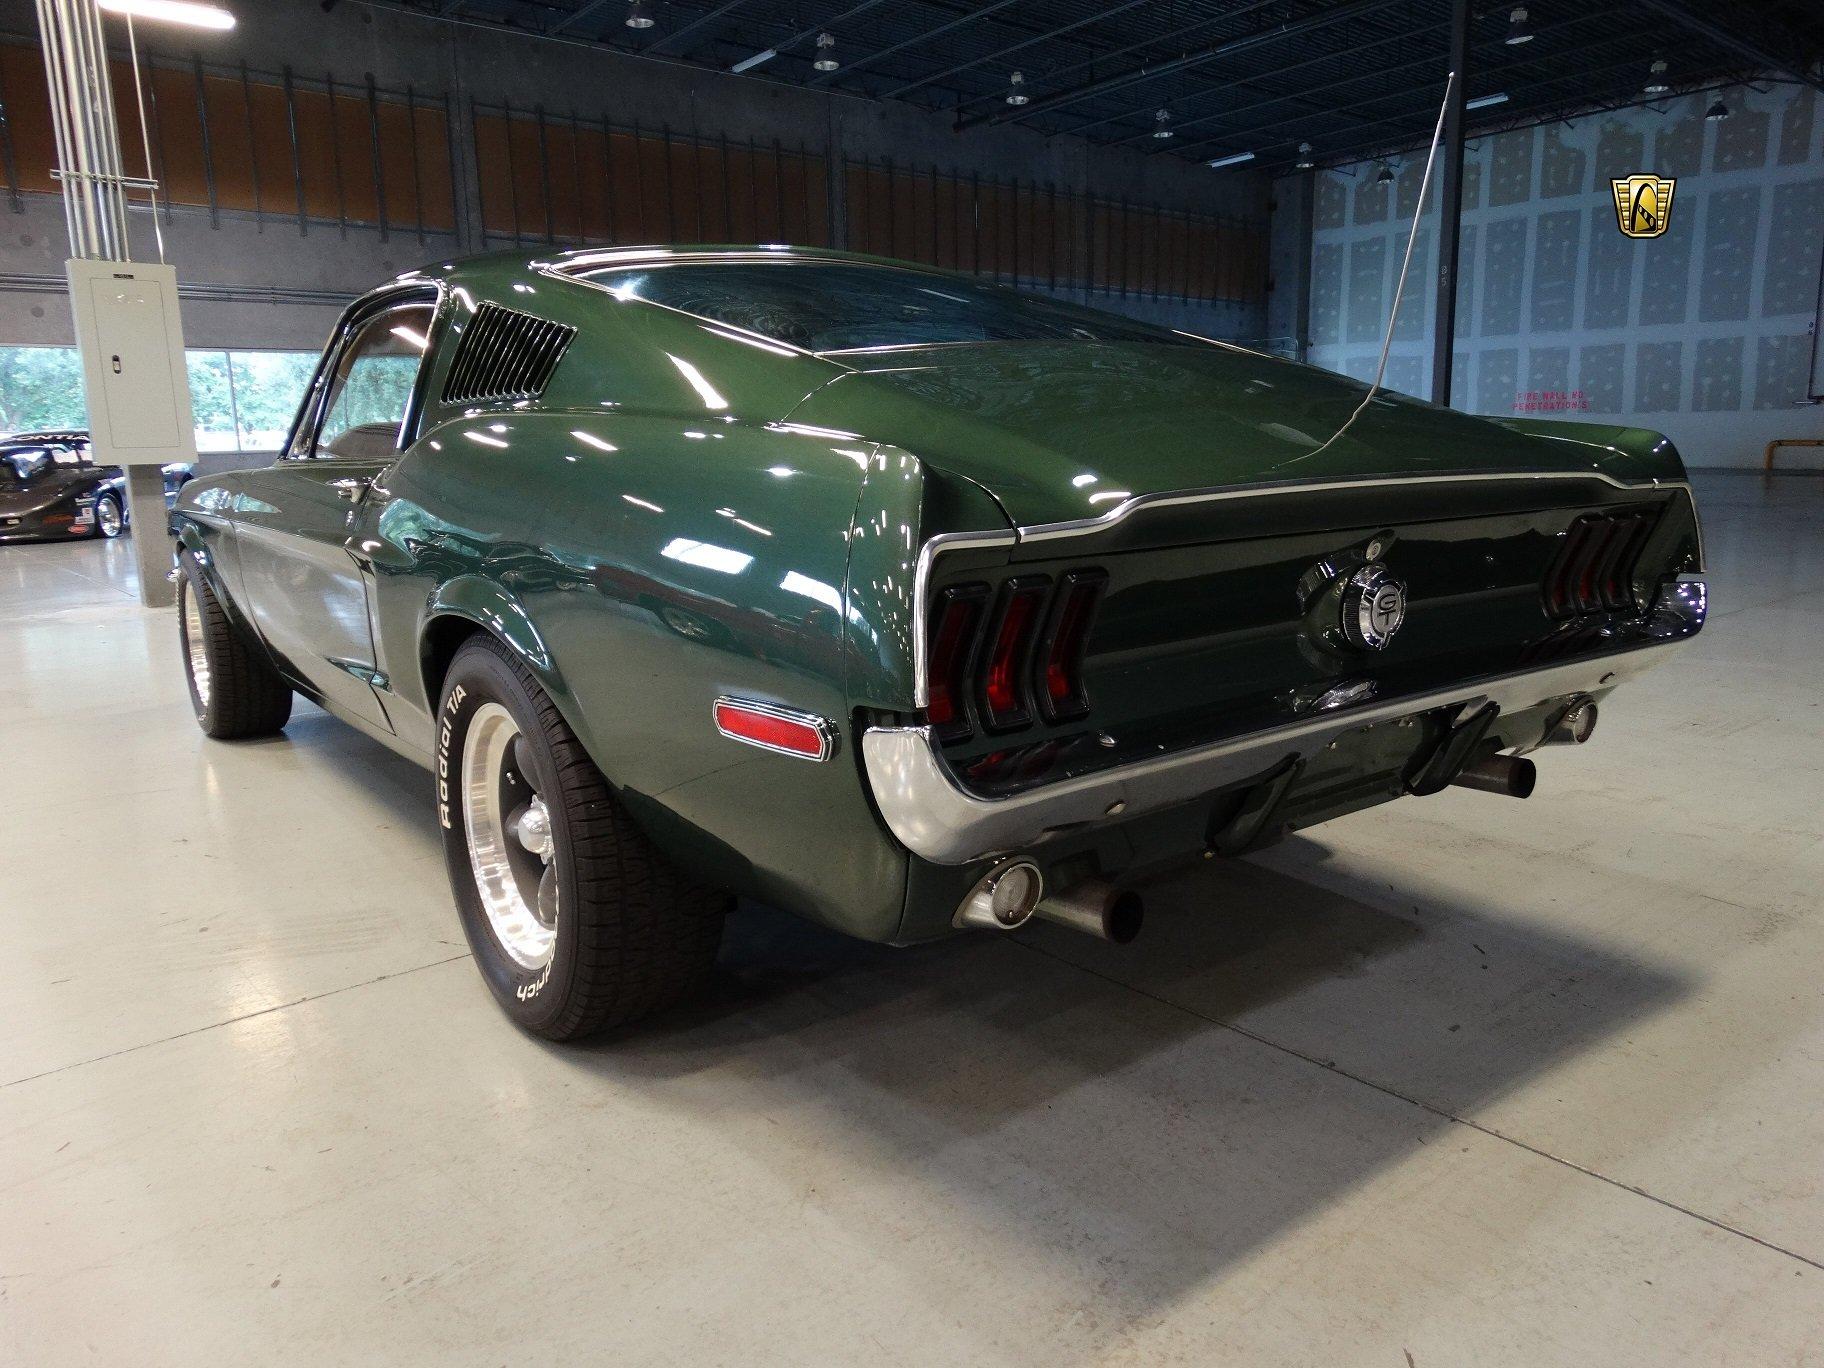 1968 ford mustang bullitt 390 fastback green cars classic wallpaper 1824x1368 802262. Black Bedroom Furniture Sets. Home Design Ideas